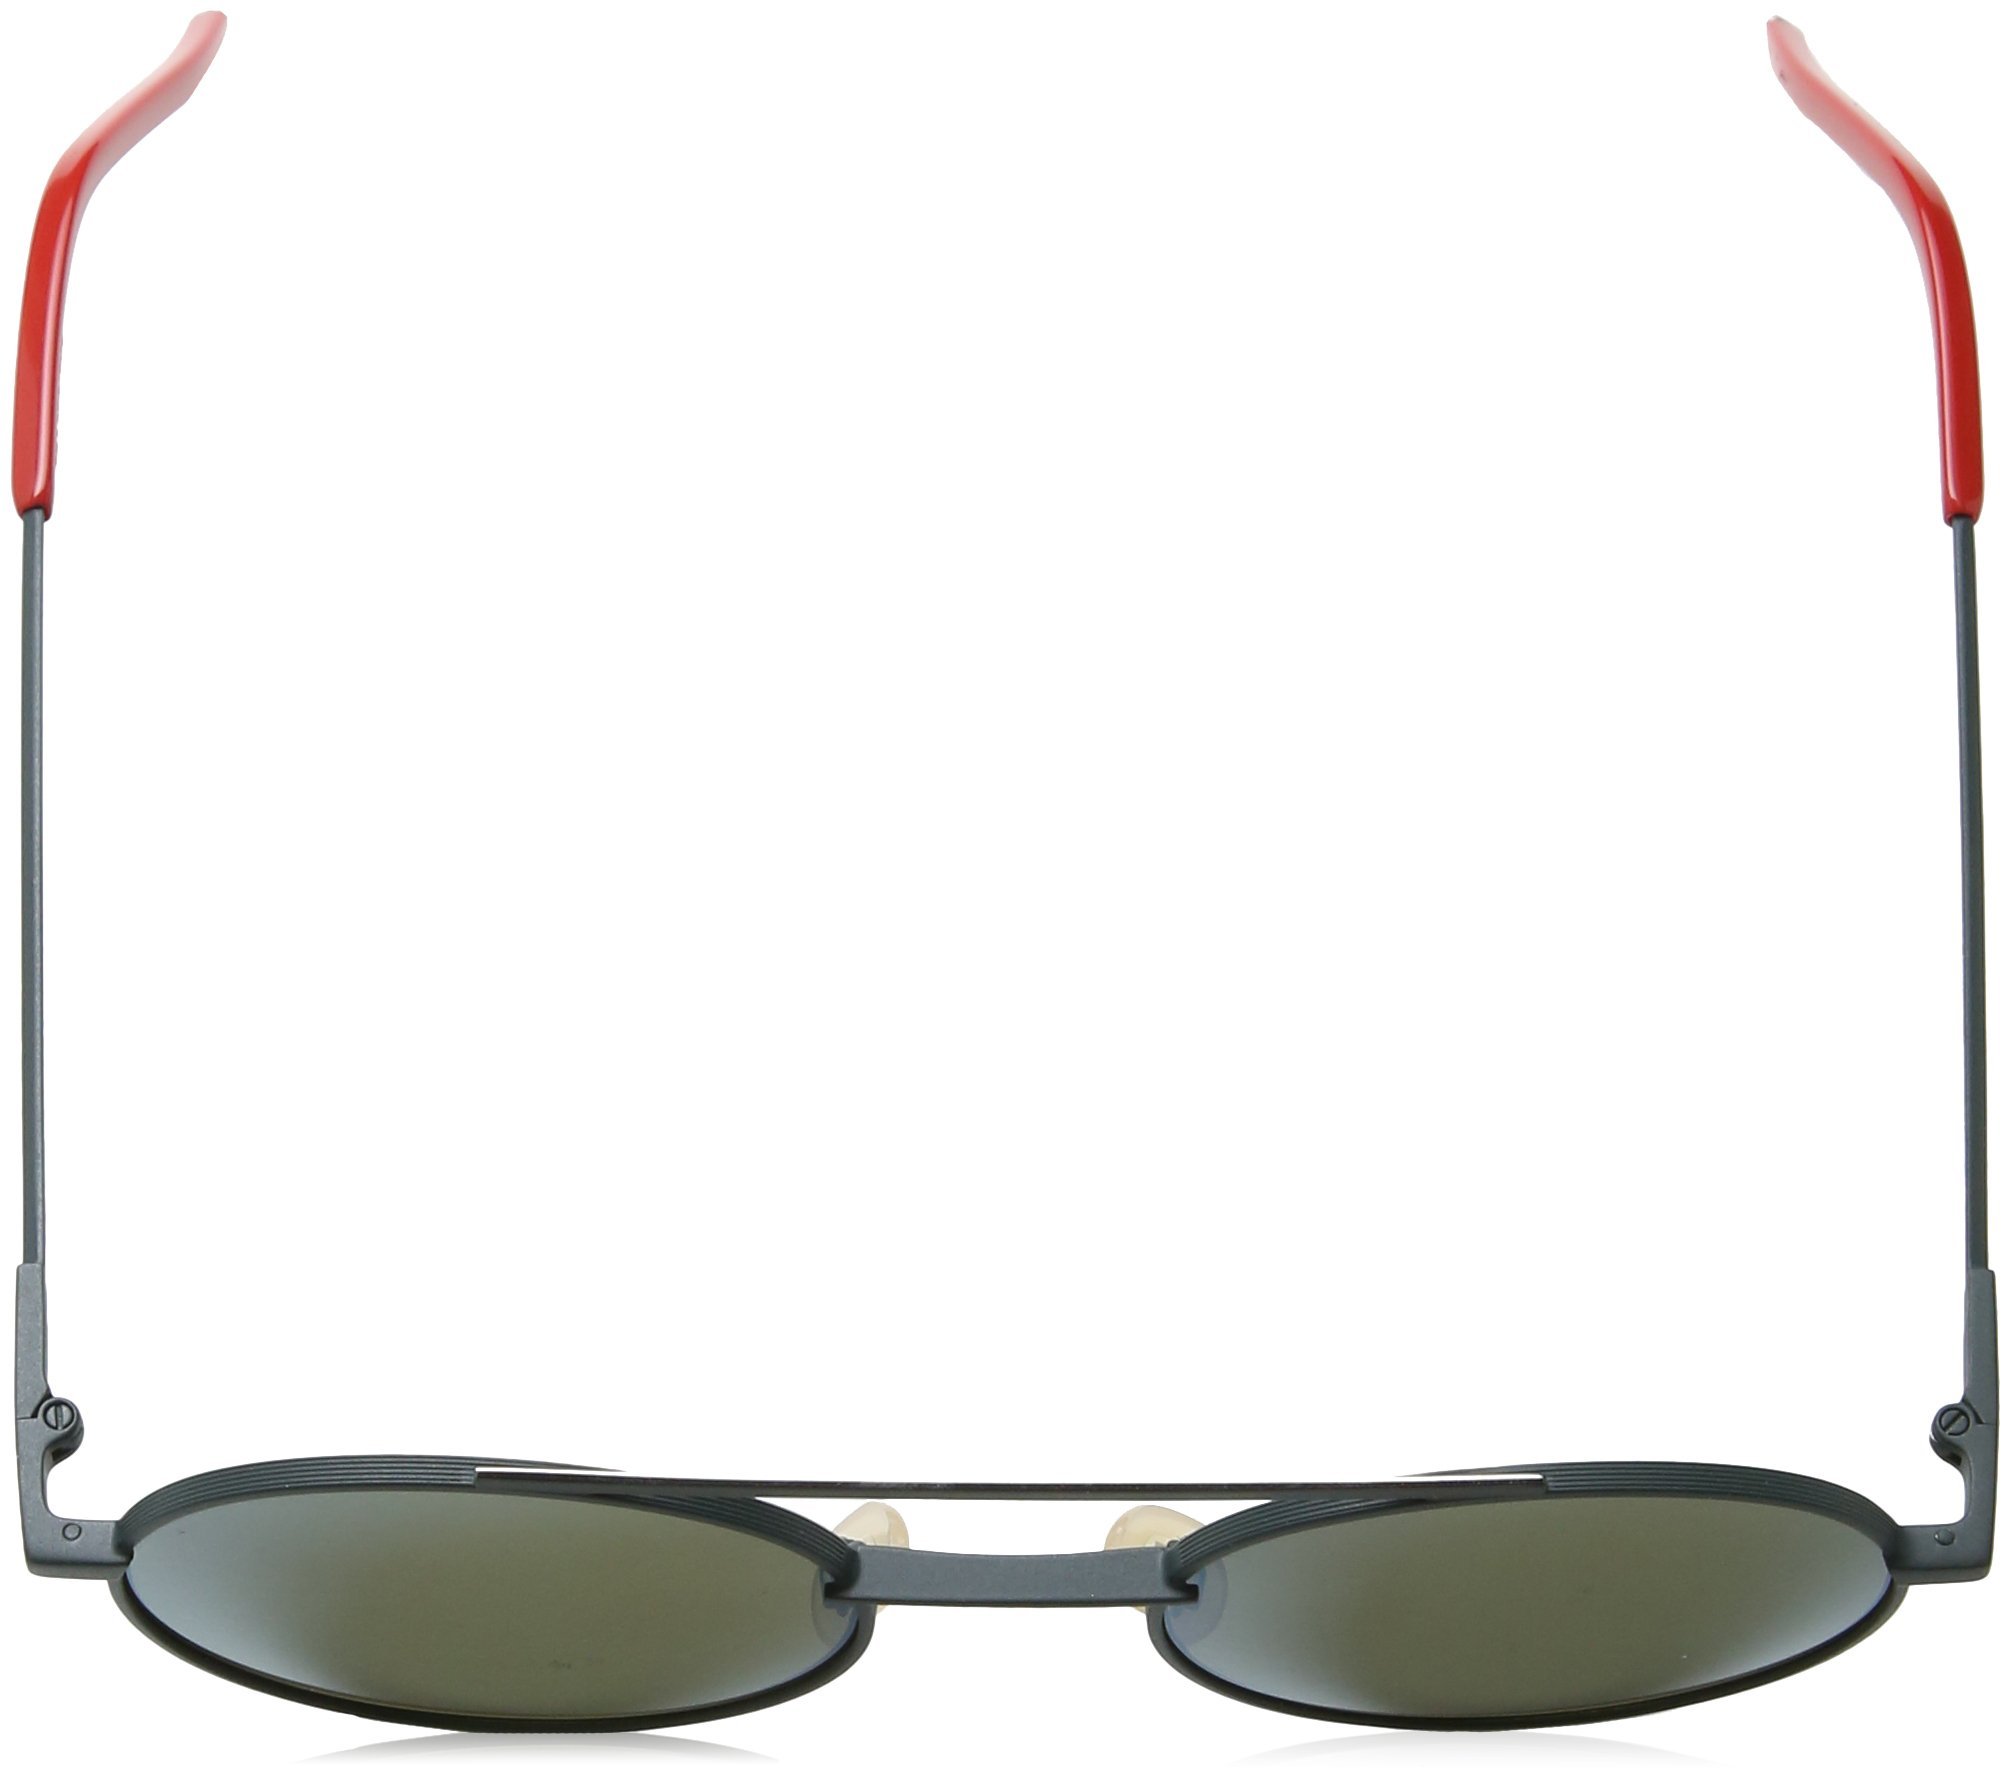 86593b1a39e Sunglasses Fendi 221  S 01ED Green   3U khaki mirror blue lens. Yêu thích